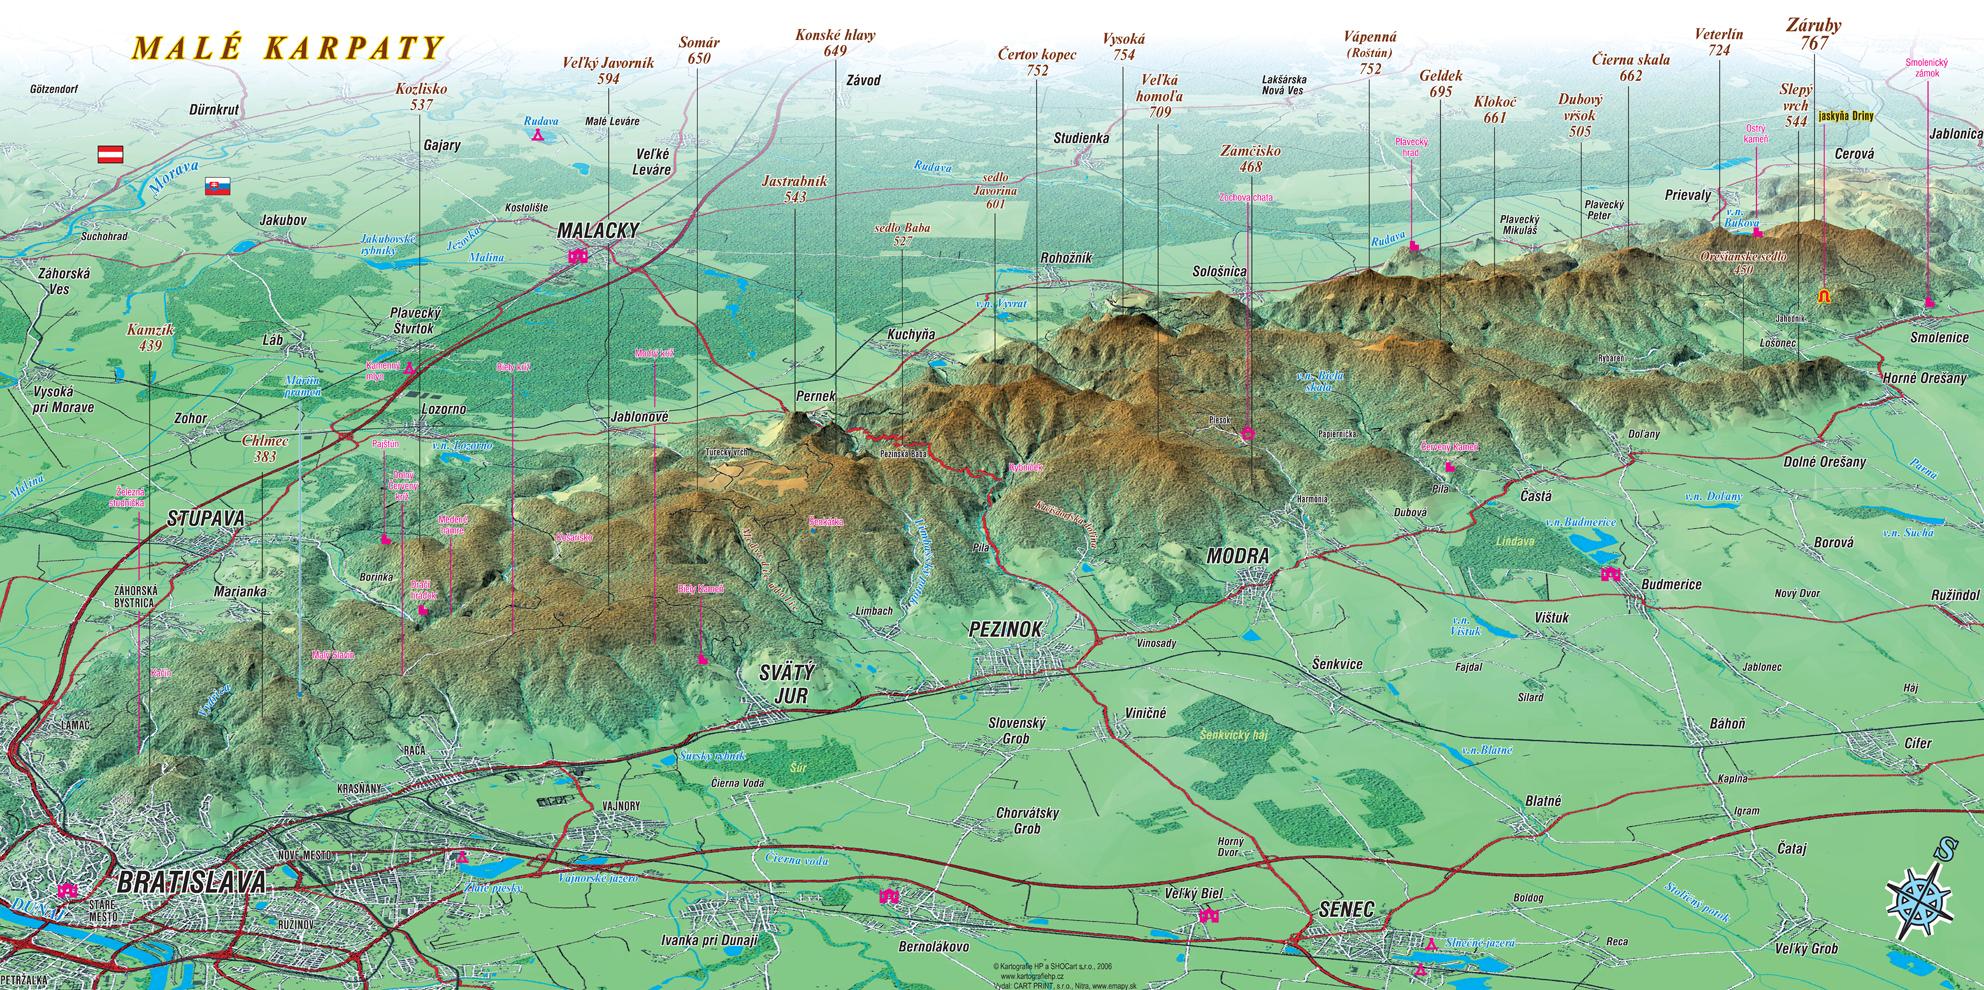 Nastenne Mapy Male Karpaty 52x100cm Panoramaticka Lamino Listy